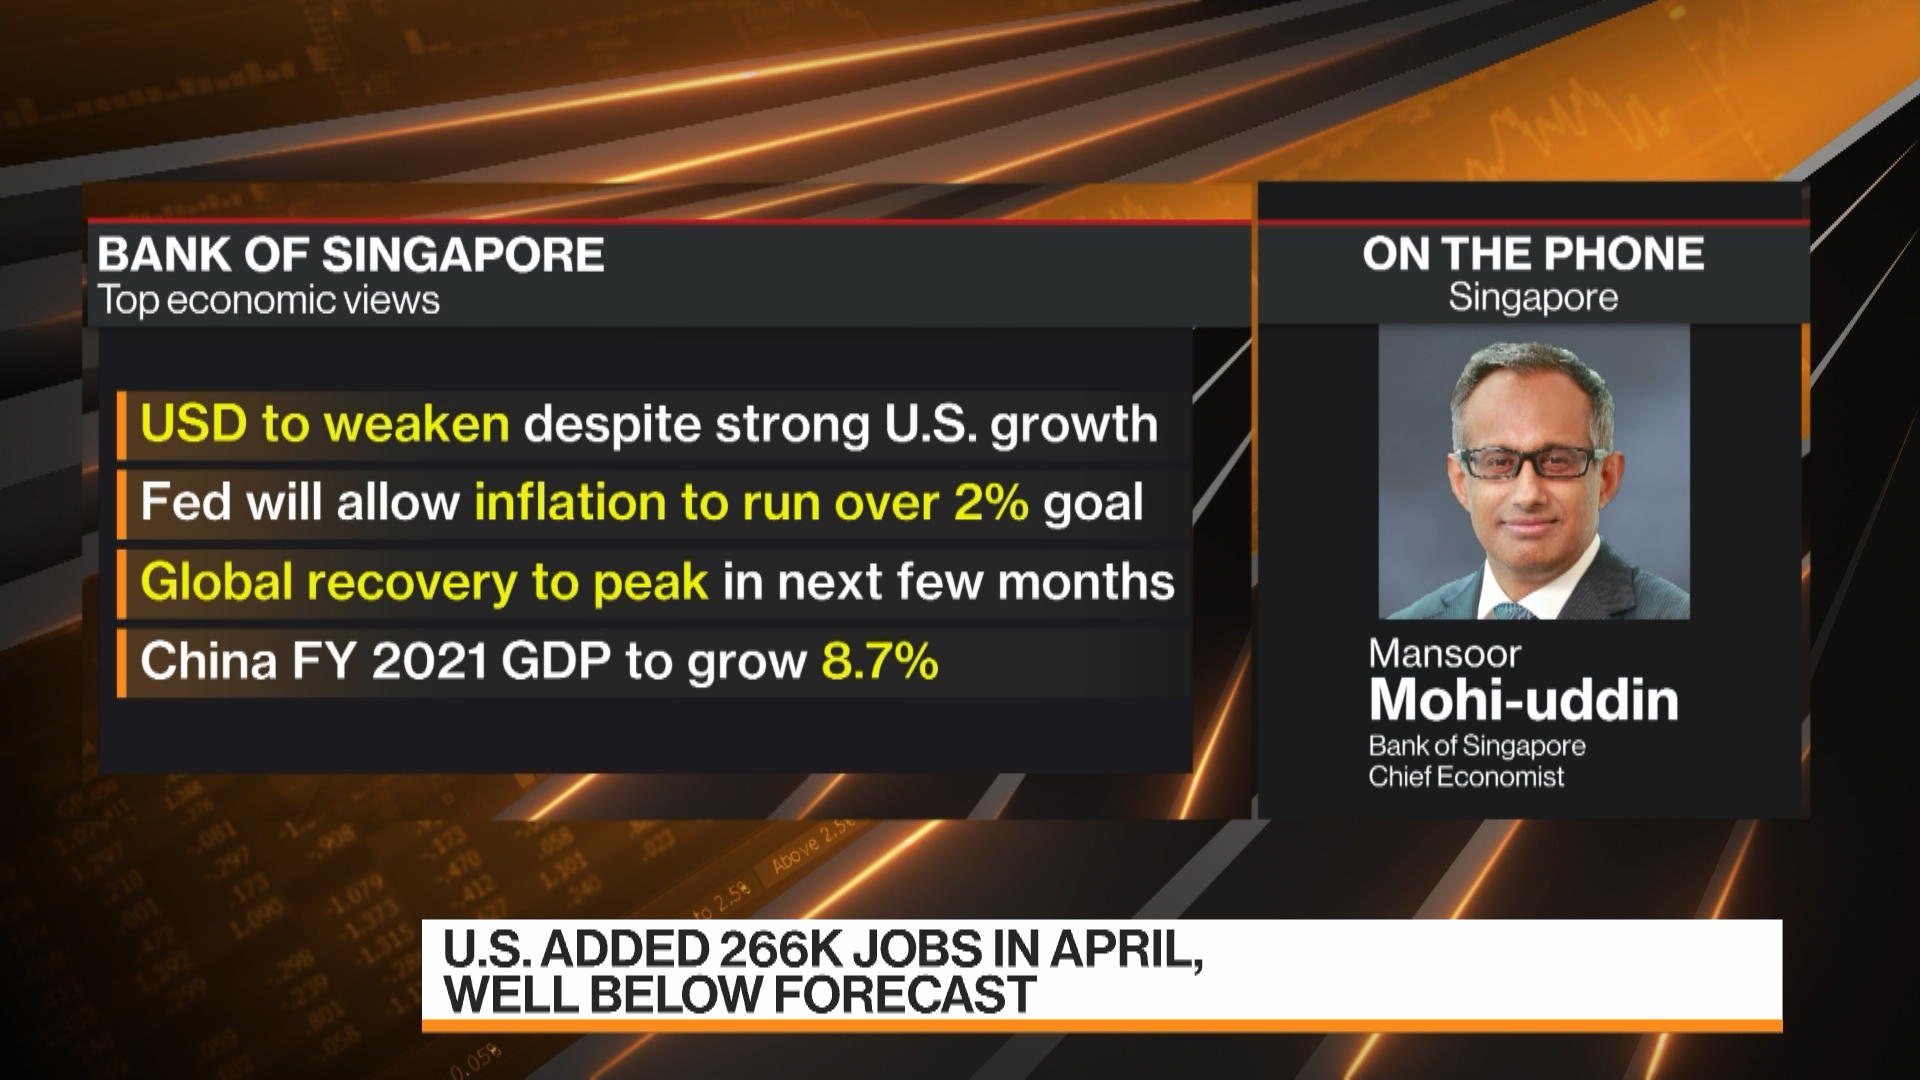 Bank of Singapore's Mohi-uddin on Dollar, U.S Jobs